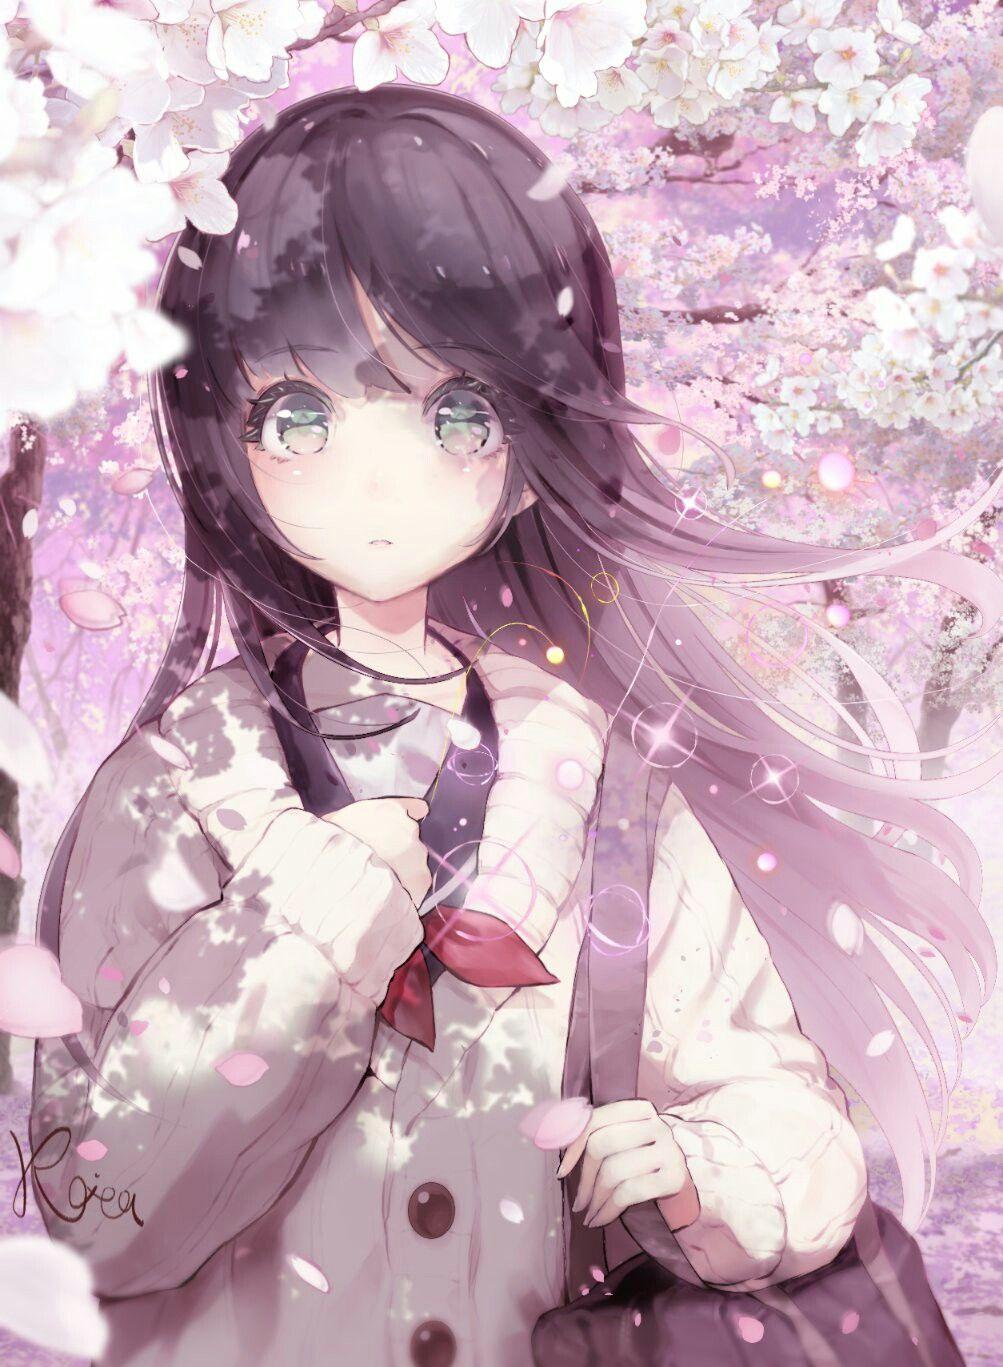 Anime Girl Original Art By Hoshizaki Reita